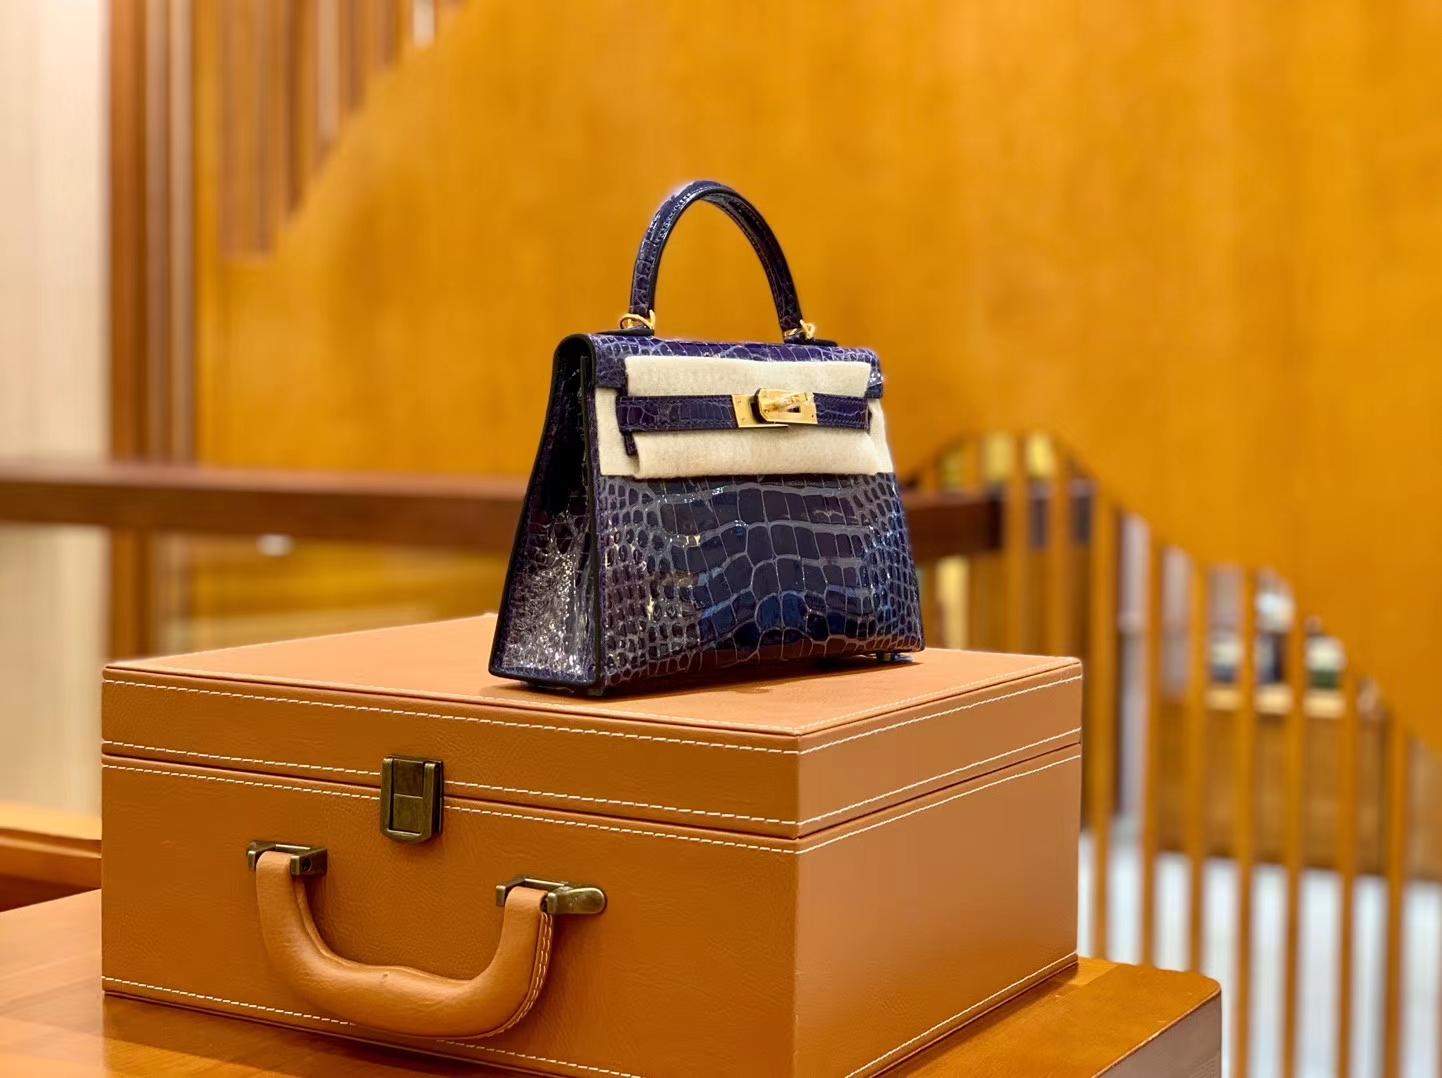 Hermès(爱马仕)迷你 2代 19cm 美洲鳄鱼 墨水蓝 金扣 全手工缝制 新增现货